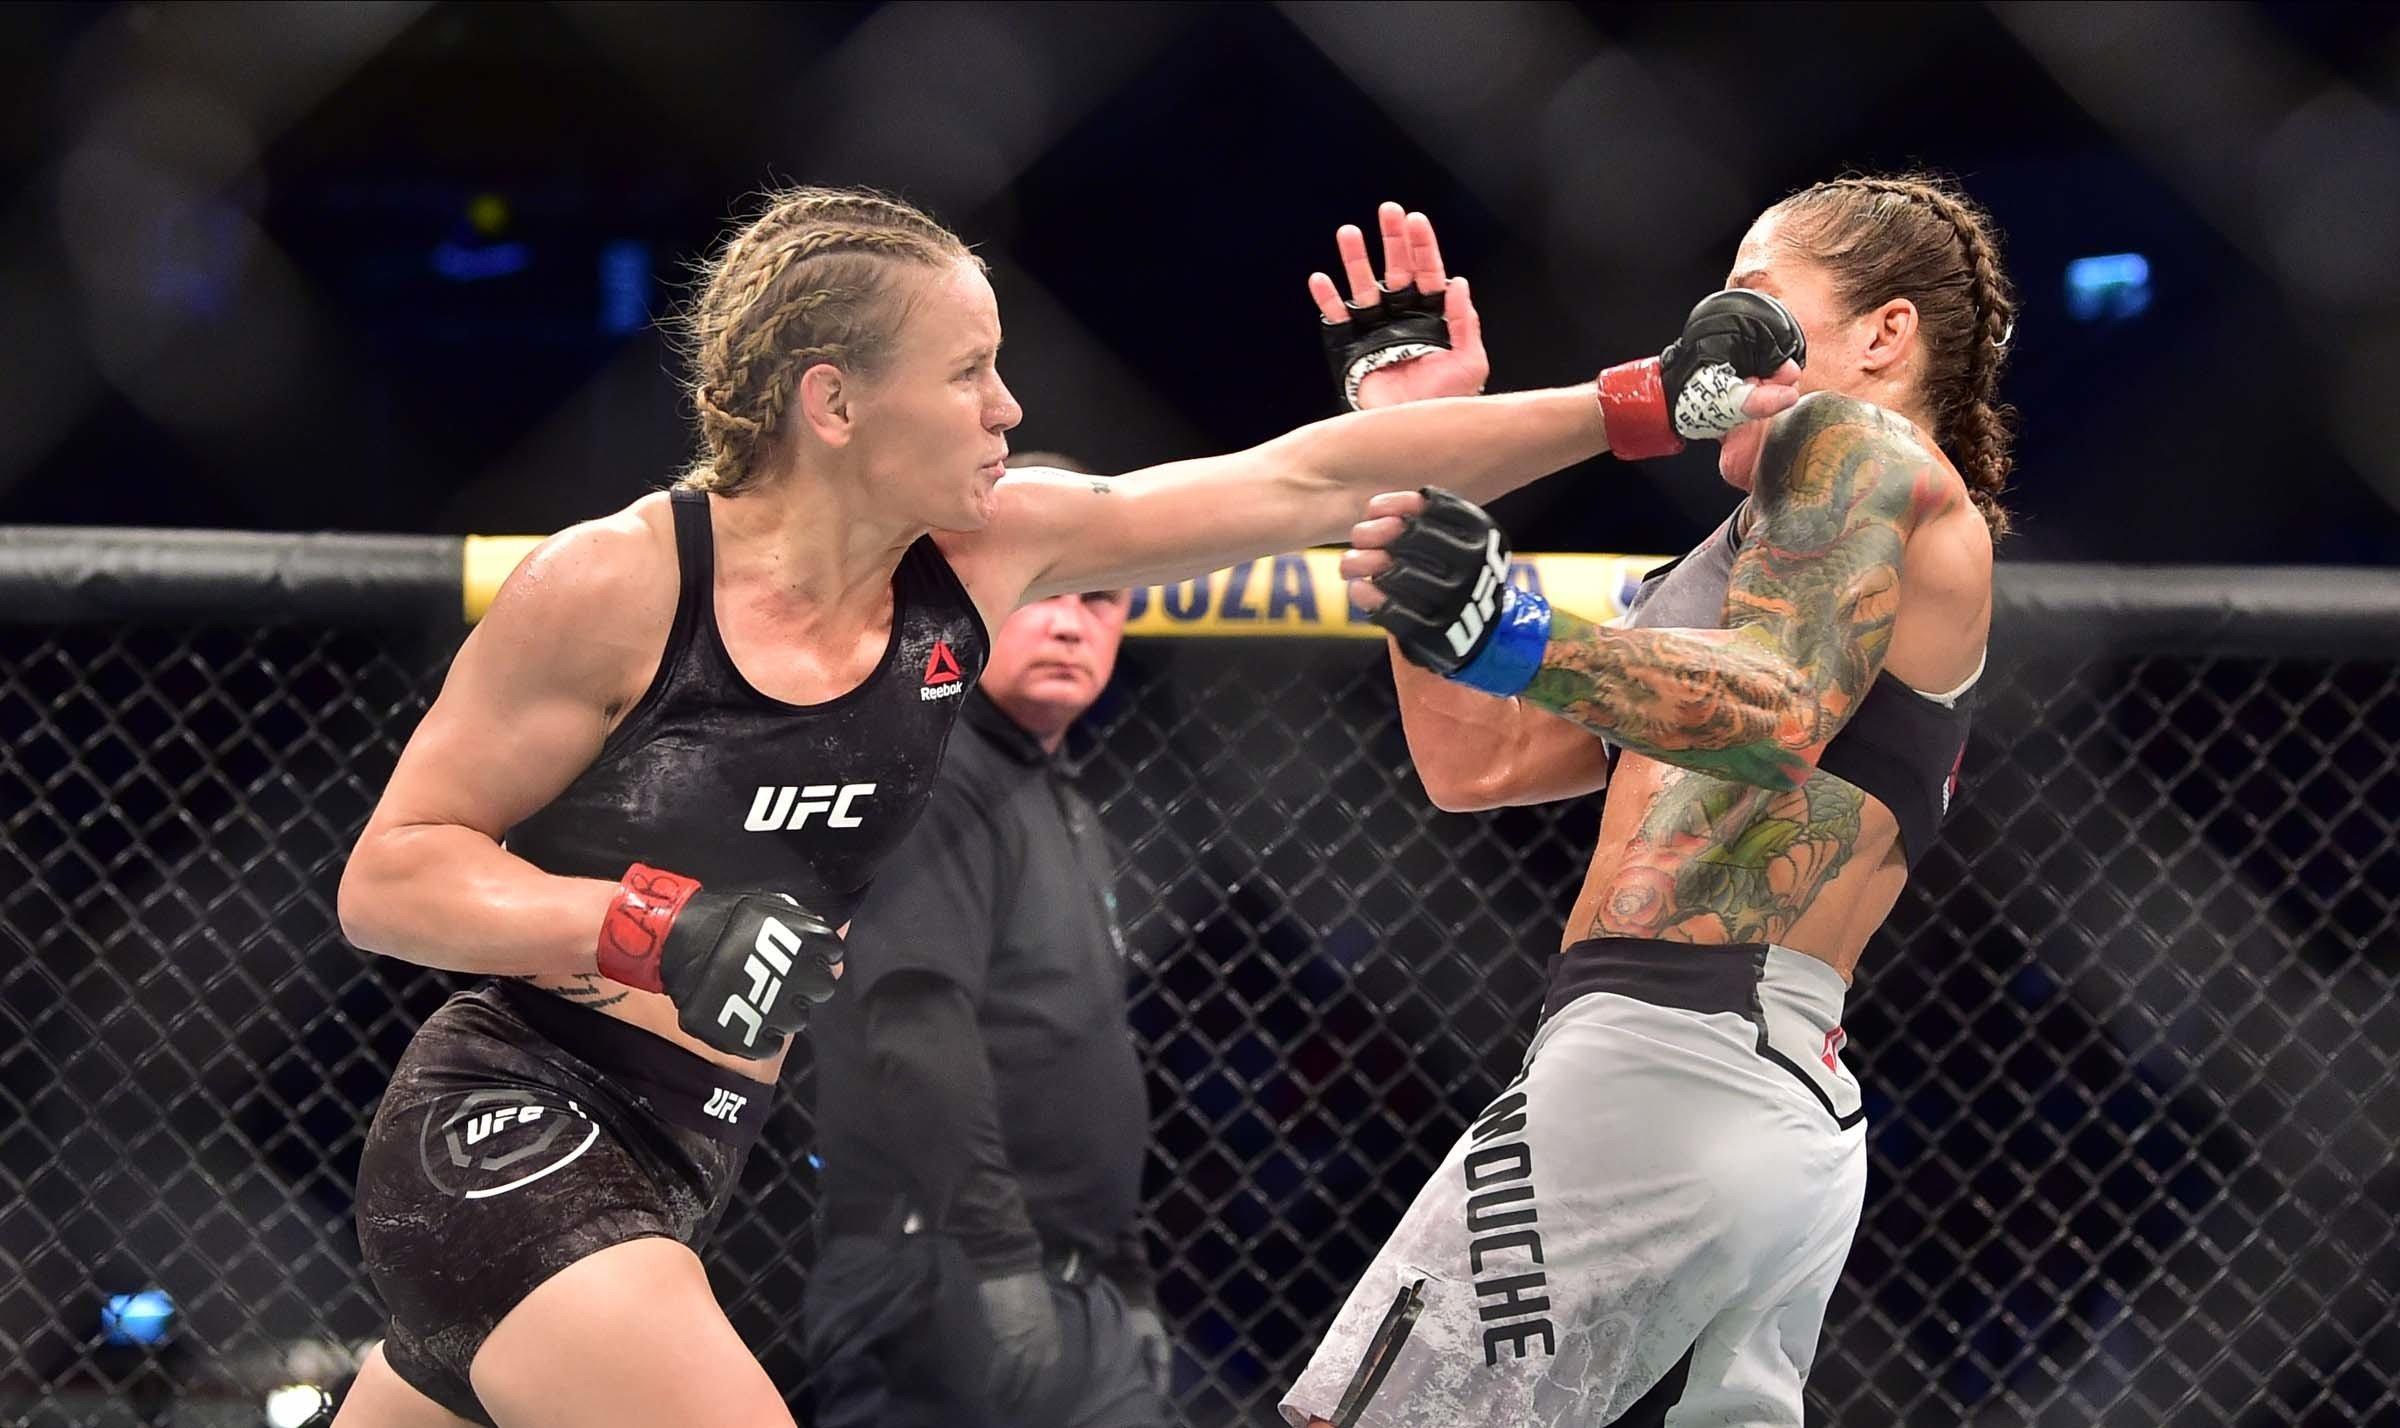 UFC 247: Valentina Shevchenko vs Katlyn Chookagian on Jones Jones card: What time is it? What channel is it on? Who else is fighting?